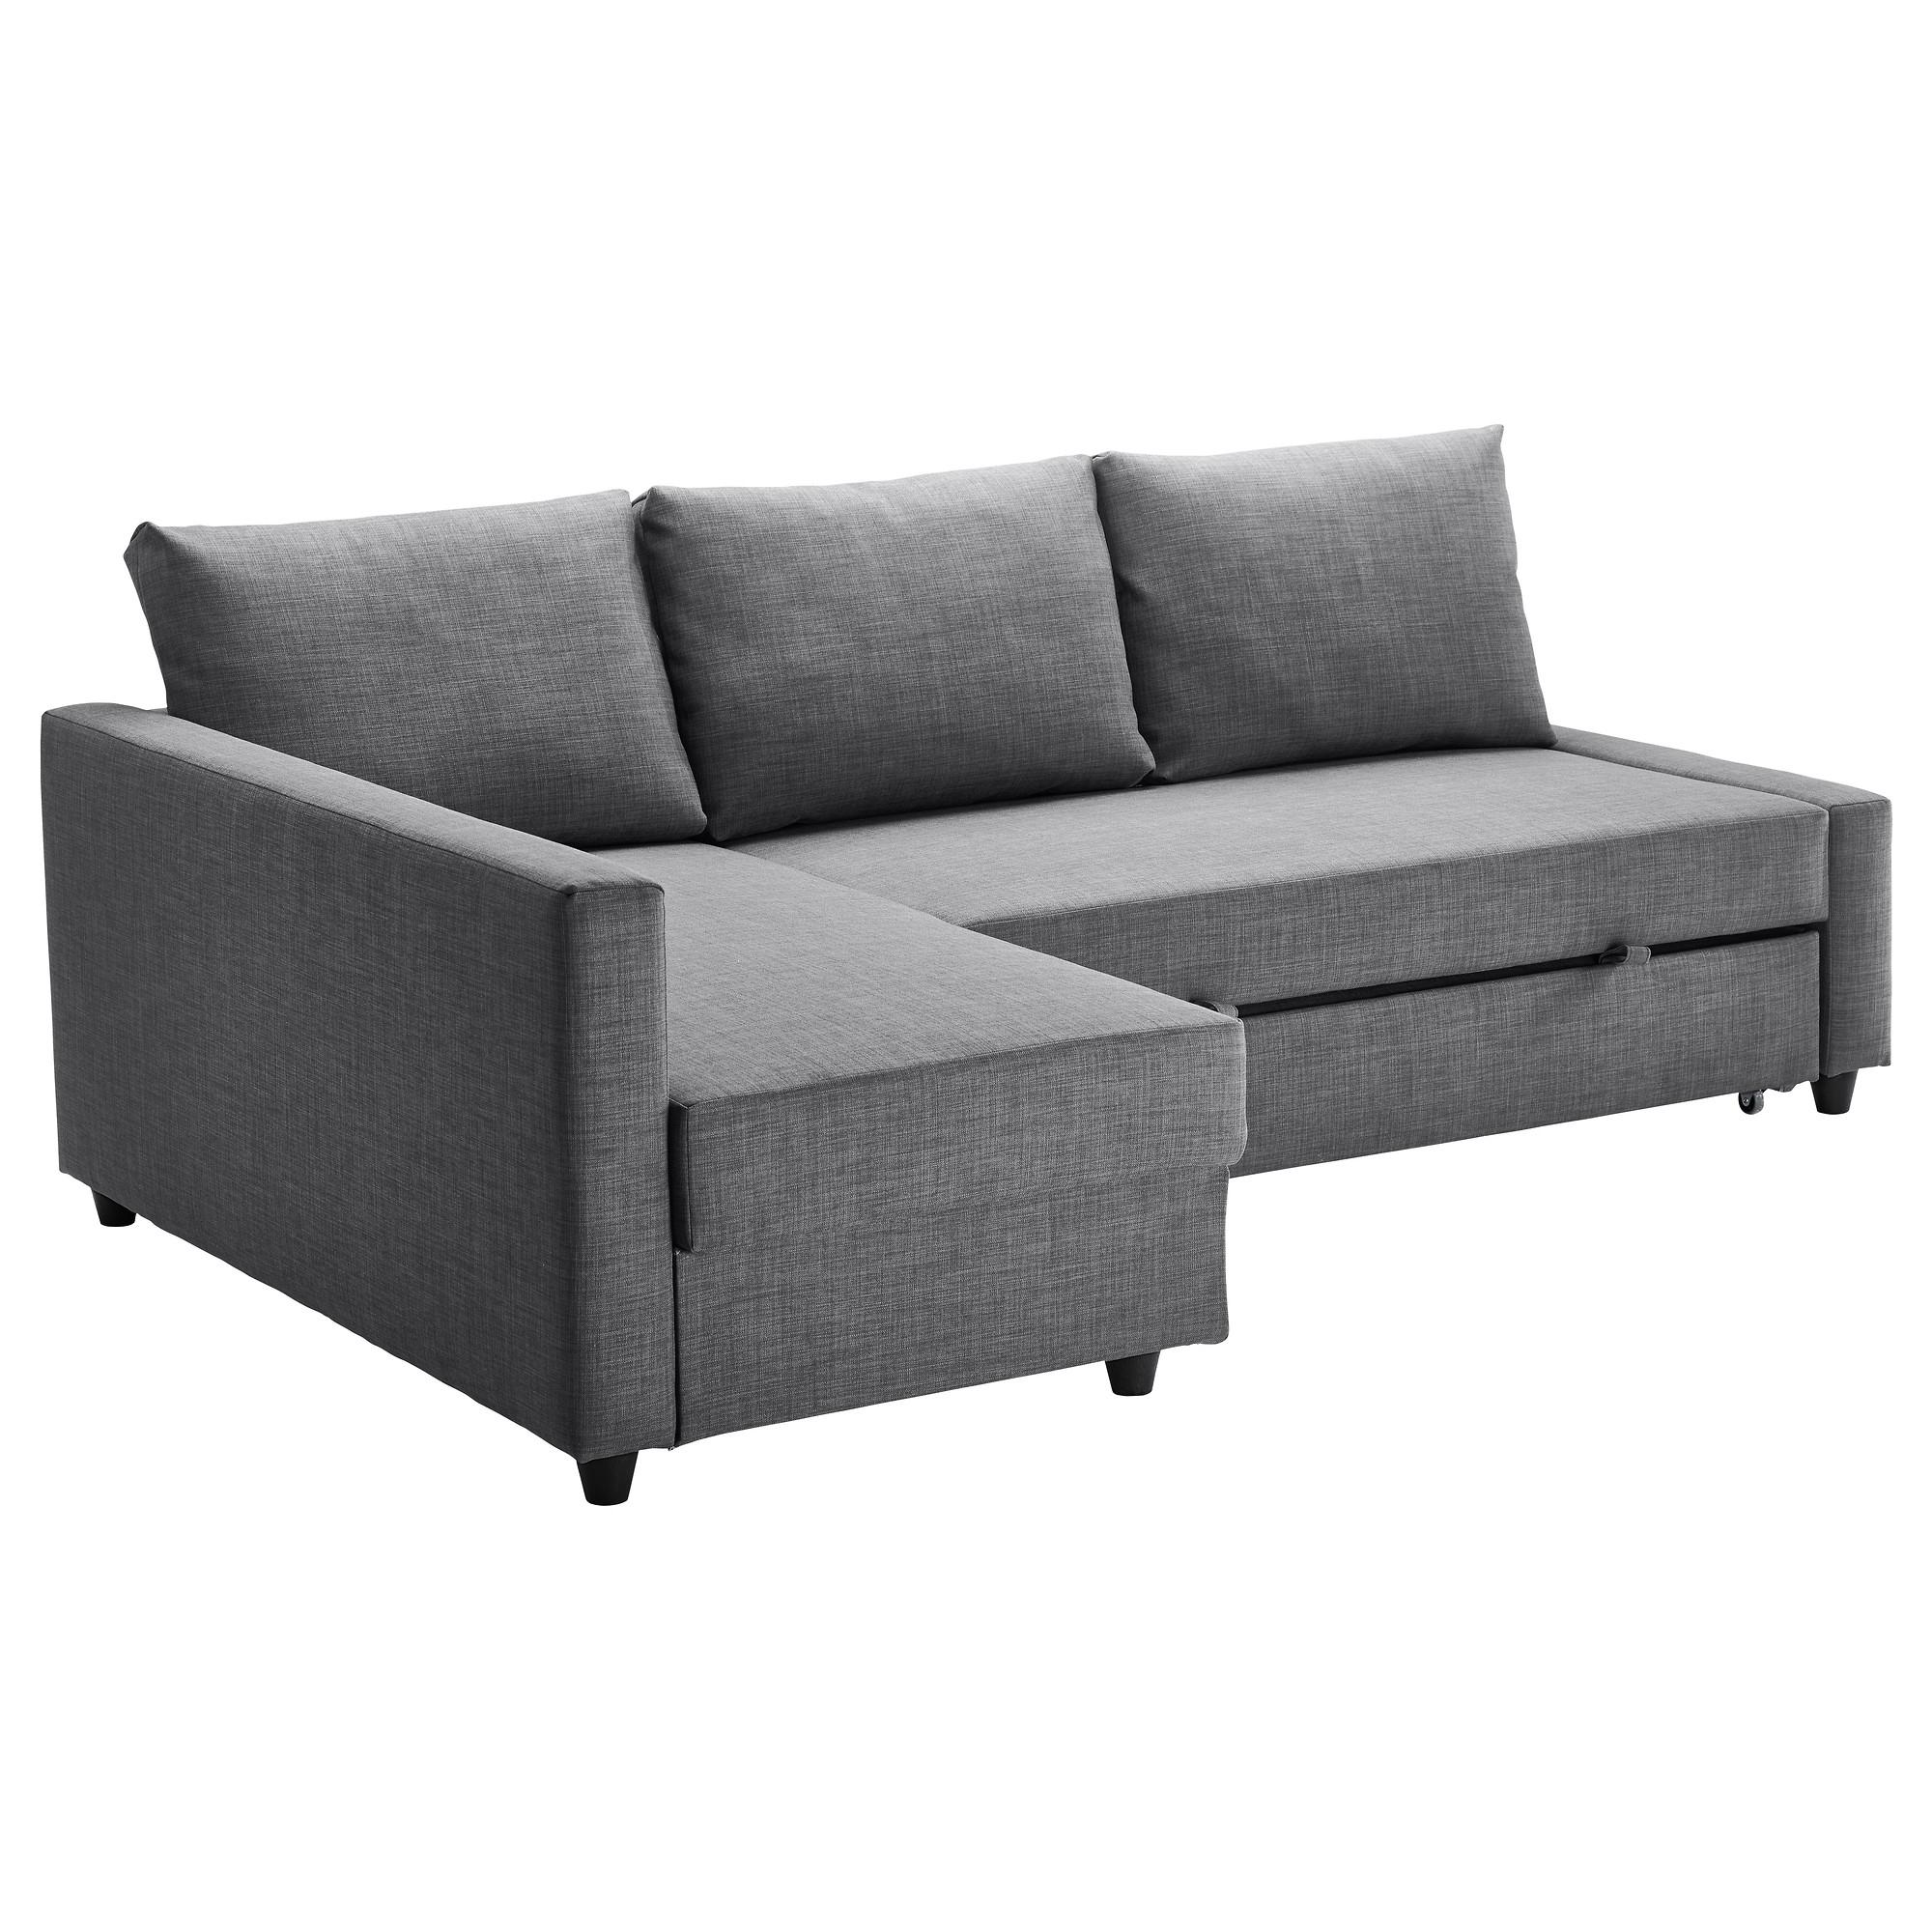 Ikea Corner Sofas With Storage With Regard To Recent Friheten Corner Sofa Bed With Storage – Skiftebo Dark Gray – Ikea (Gallery 7 of 15)